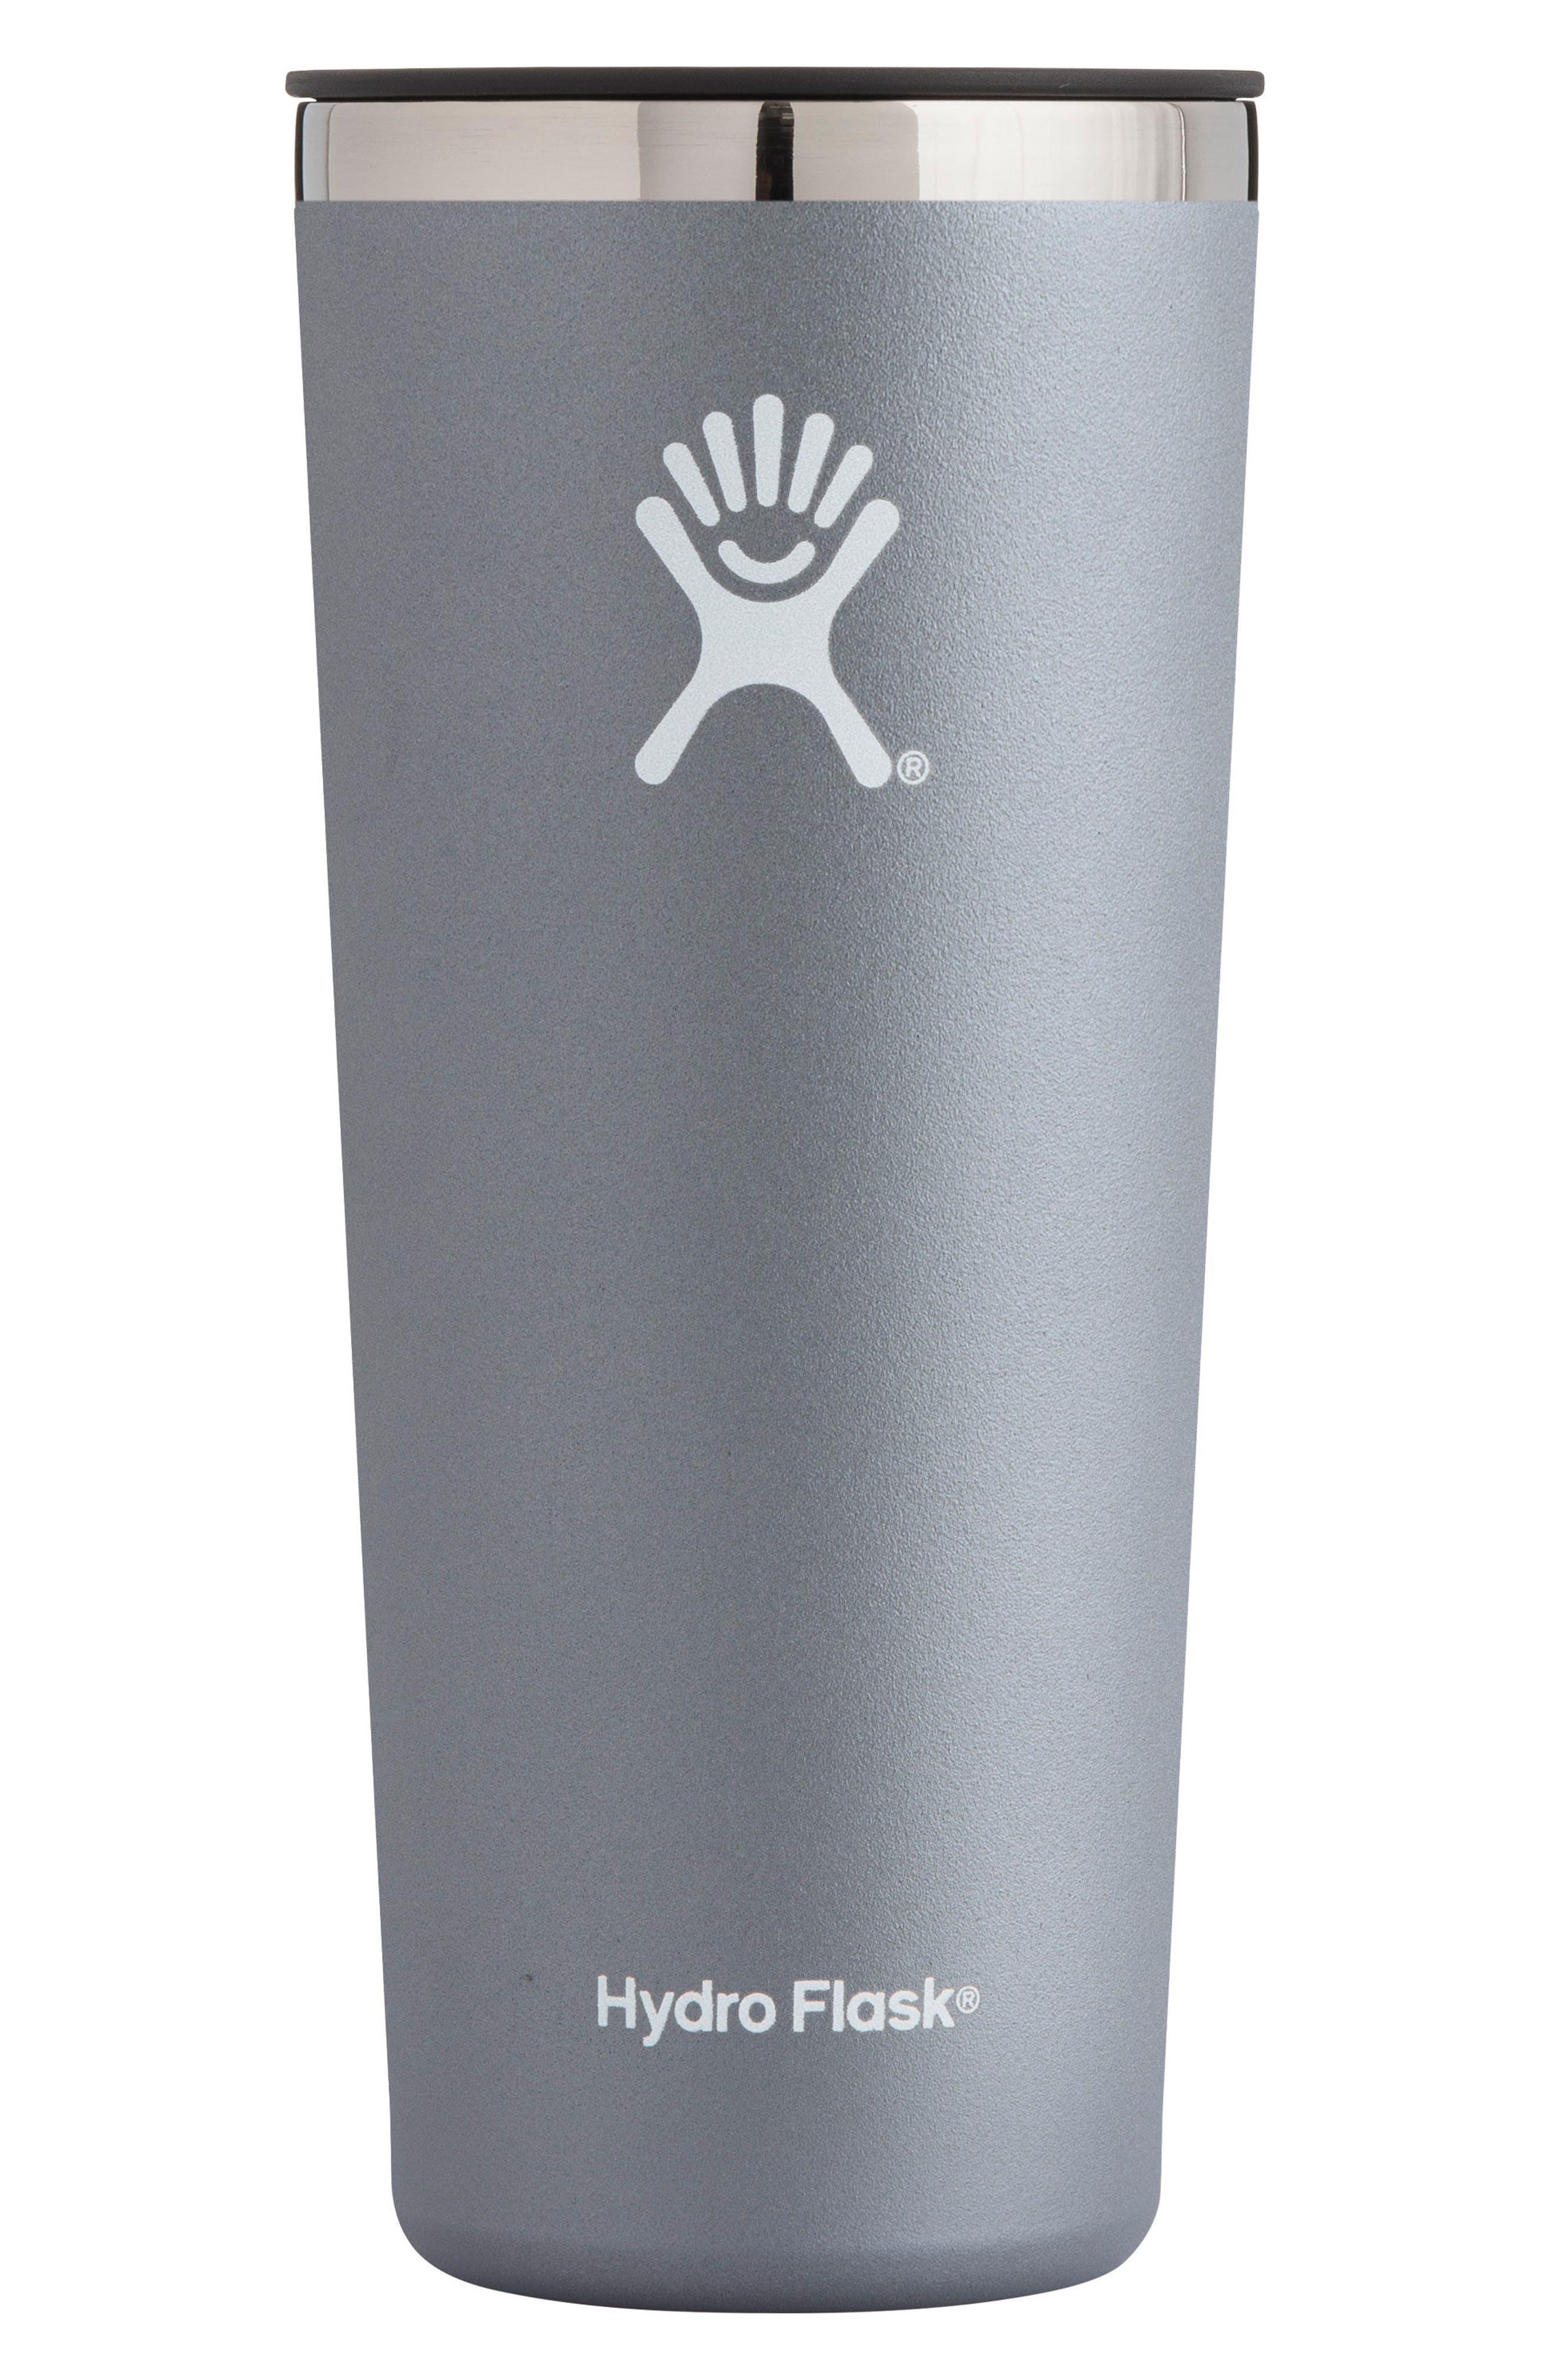 hydro flask | Nordstrom